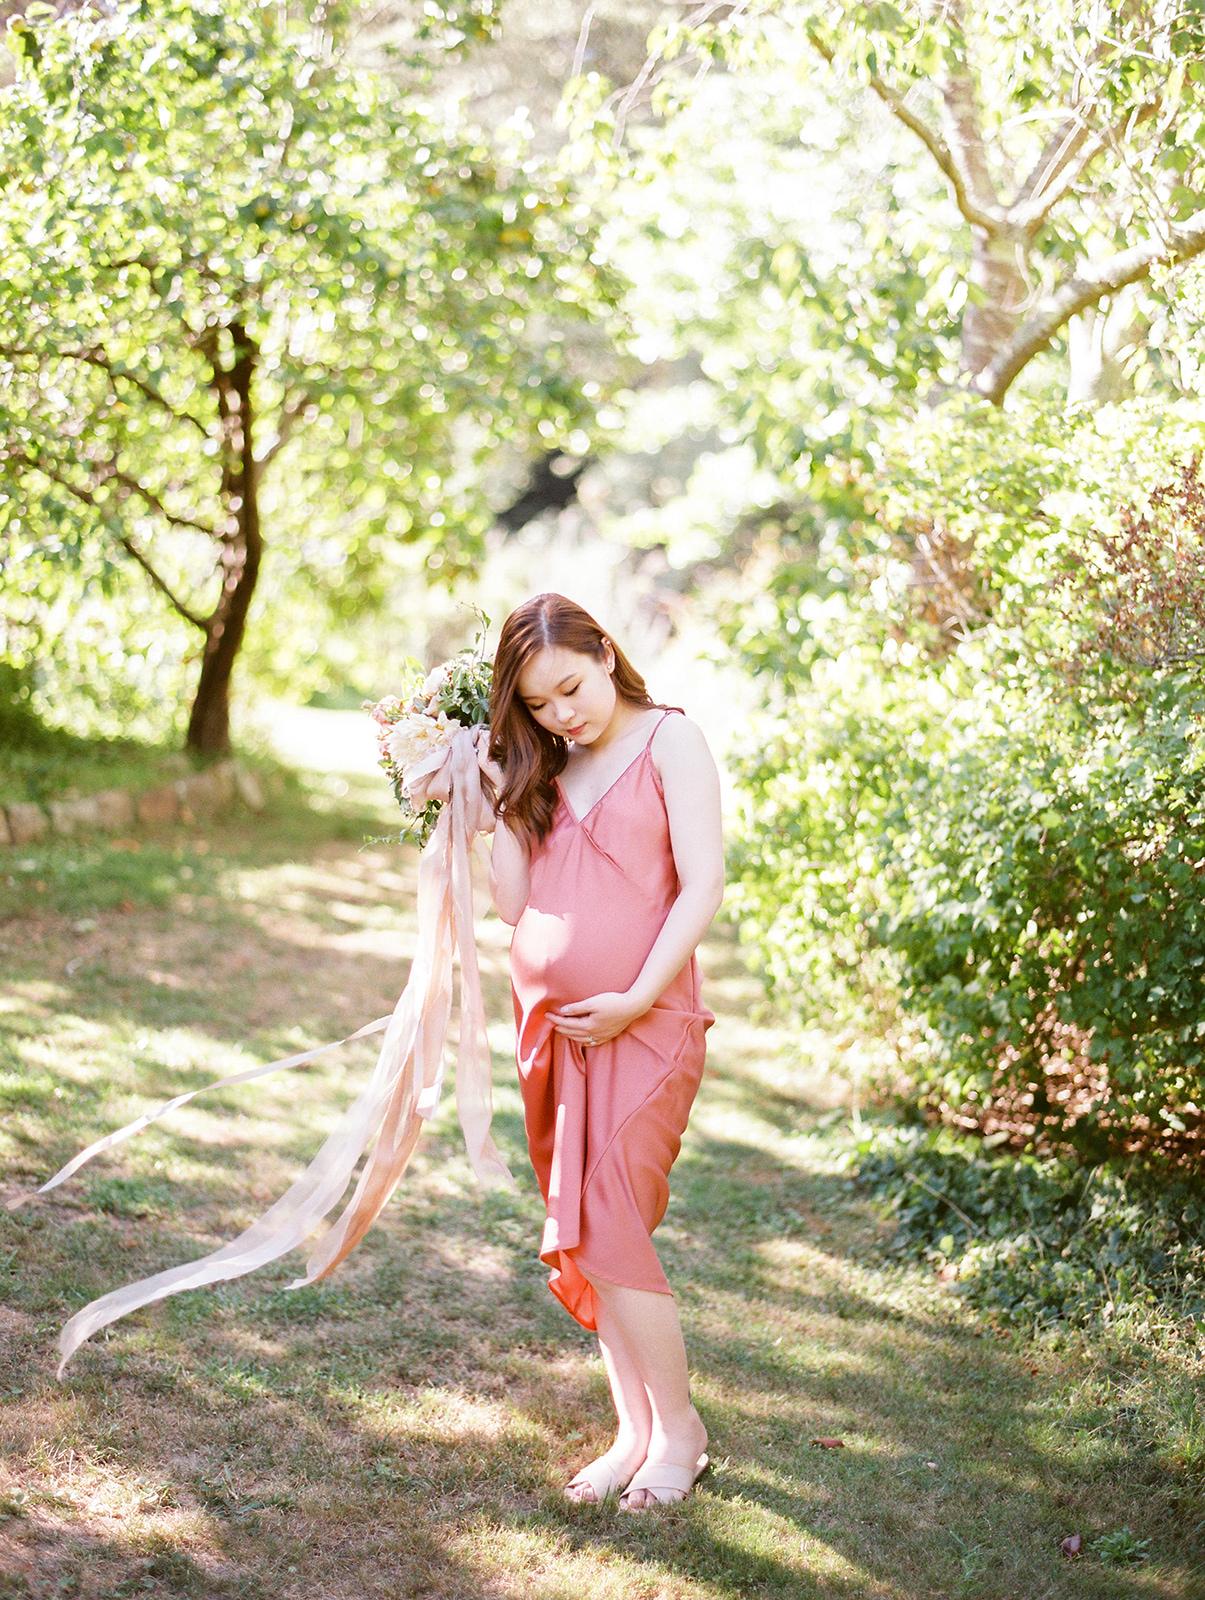 waop-charmenie_edmond-maternity-0235.jpg